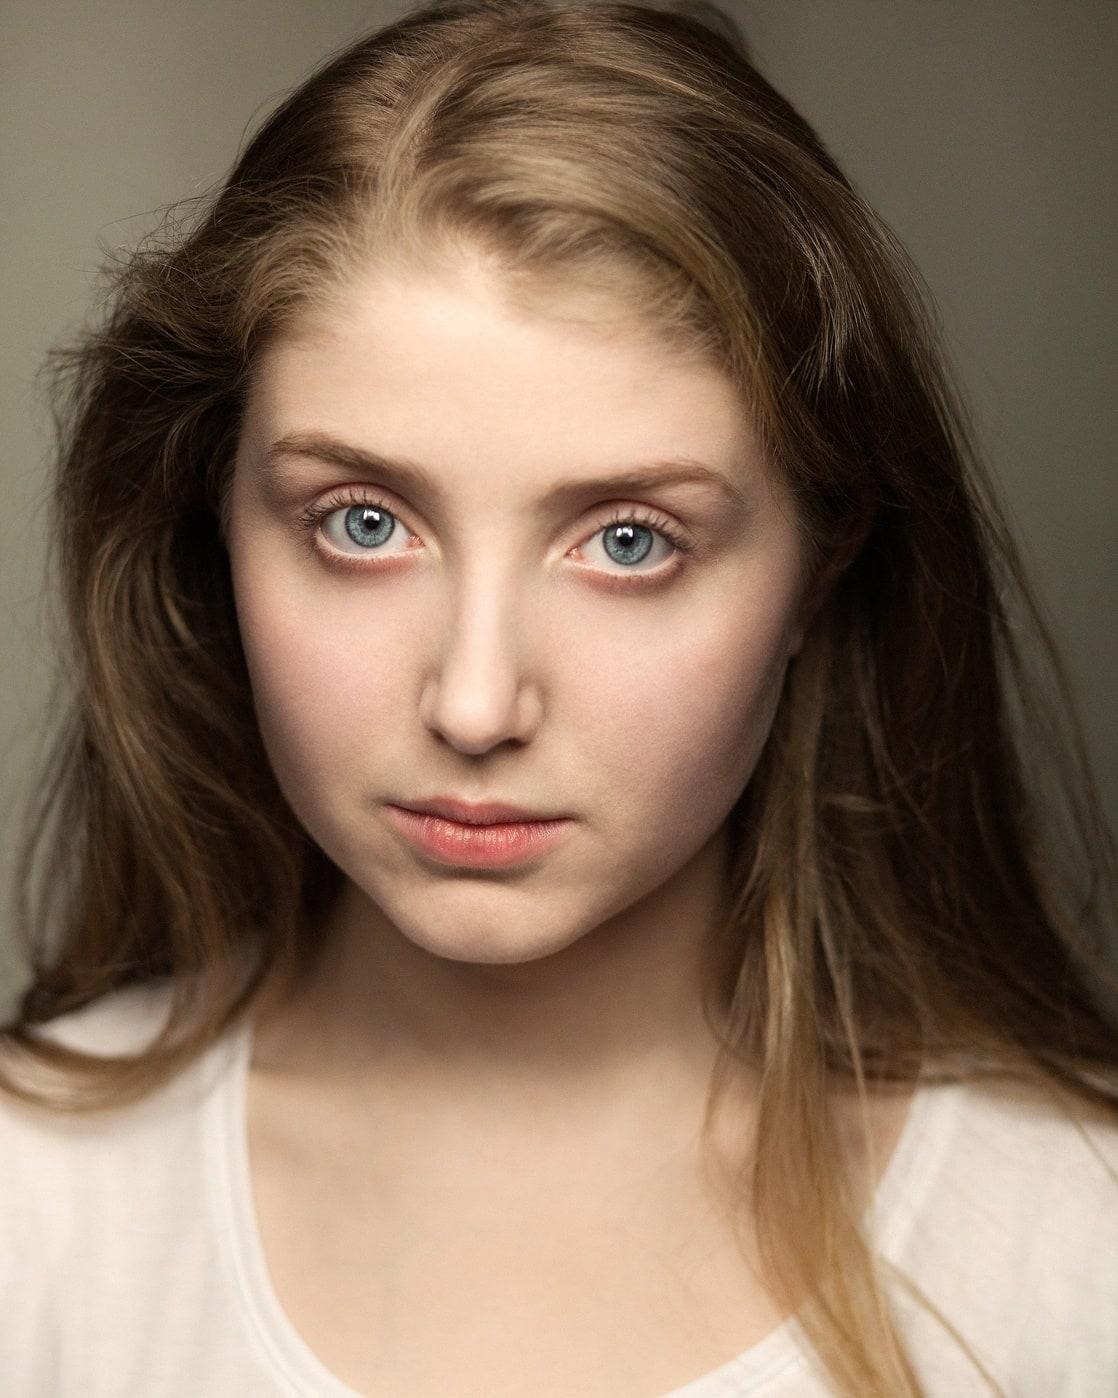 Adele Lacy